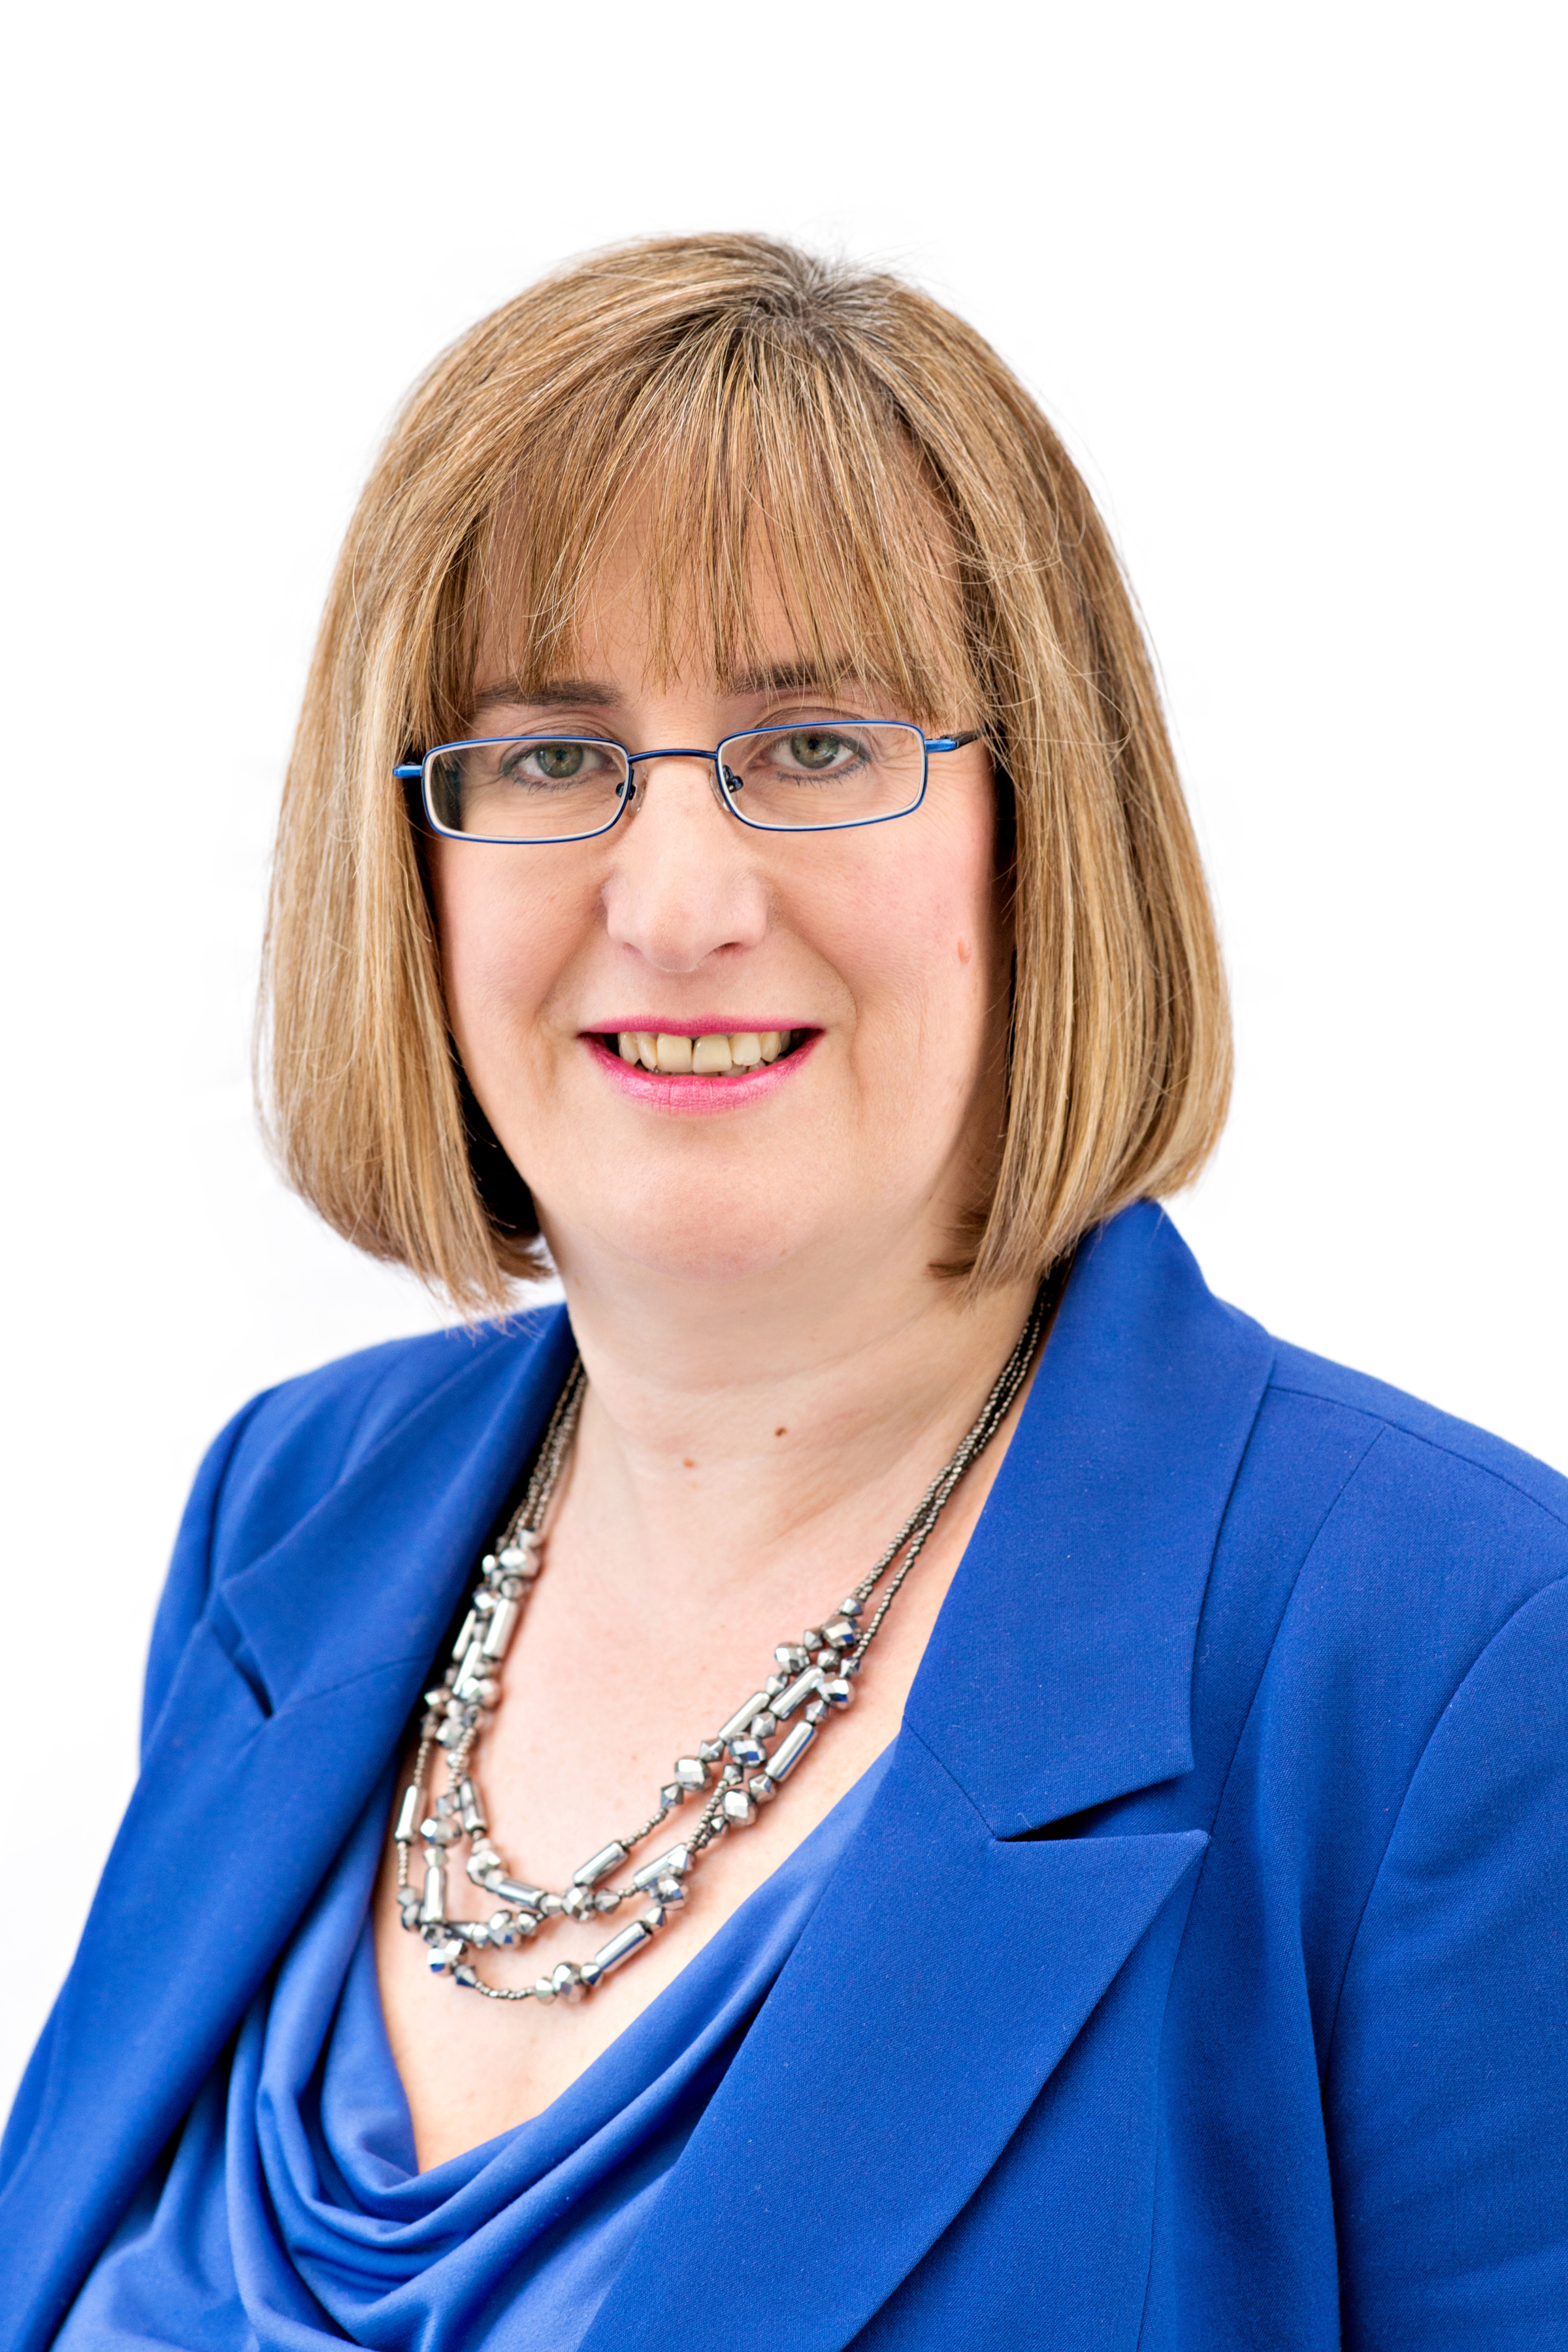 Lorna Trent - Networking Expert